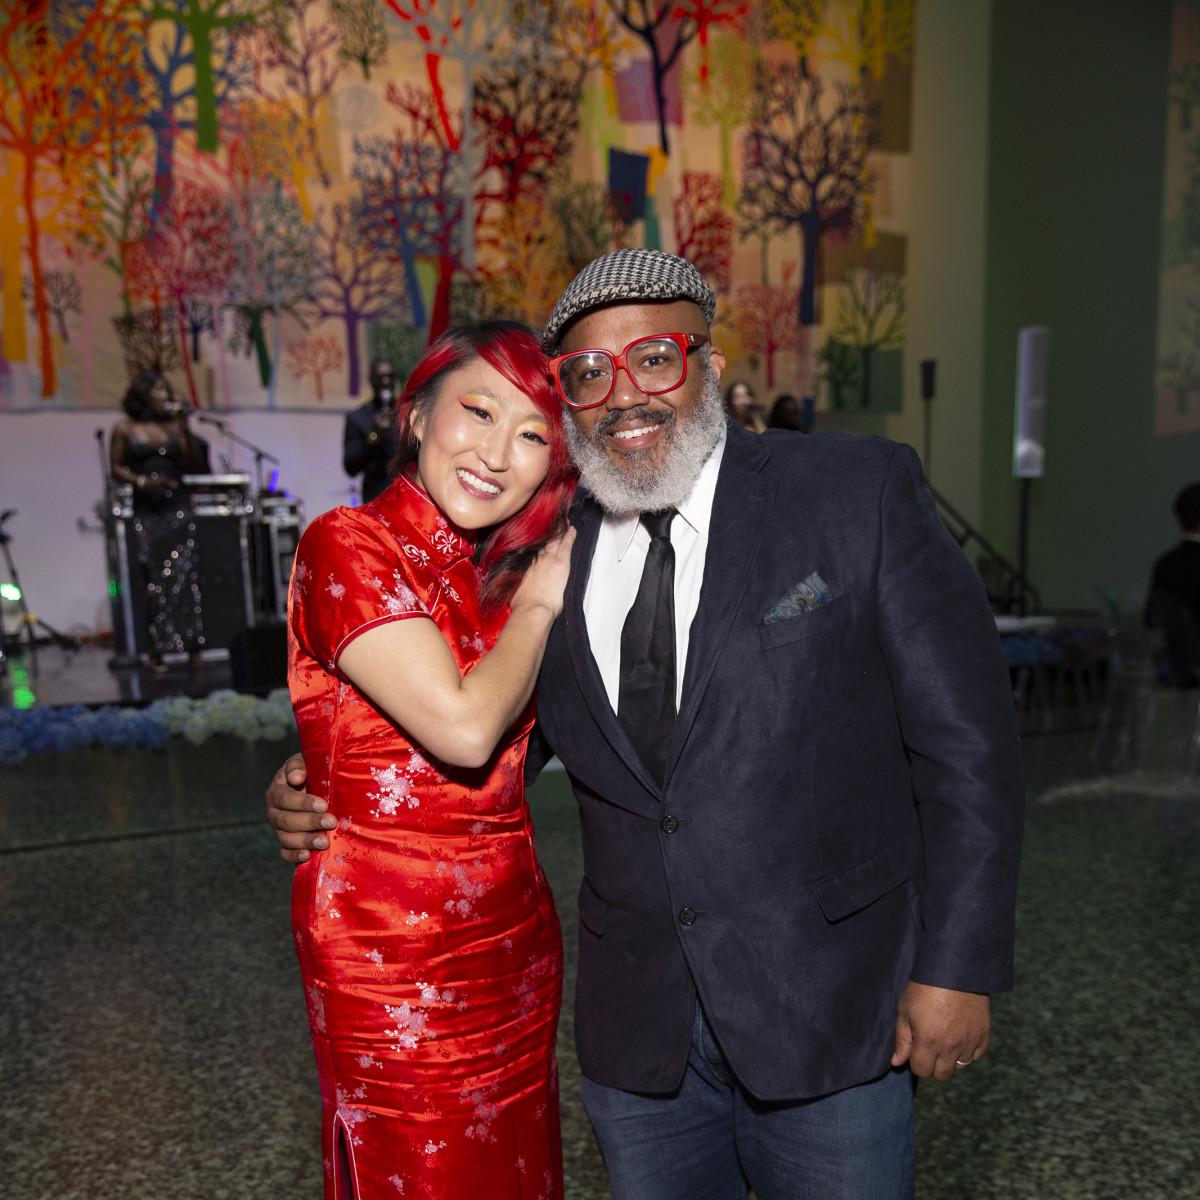 MFAH Grand Gala Ball 2019 JooYoung Choi Trenton Doyle Hancock